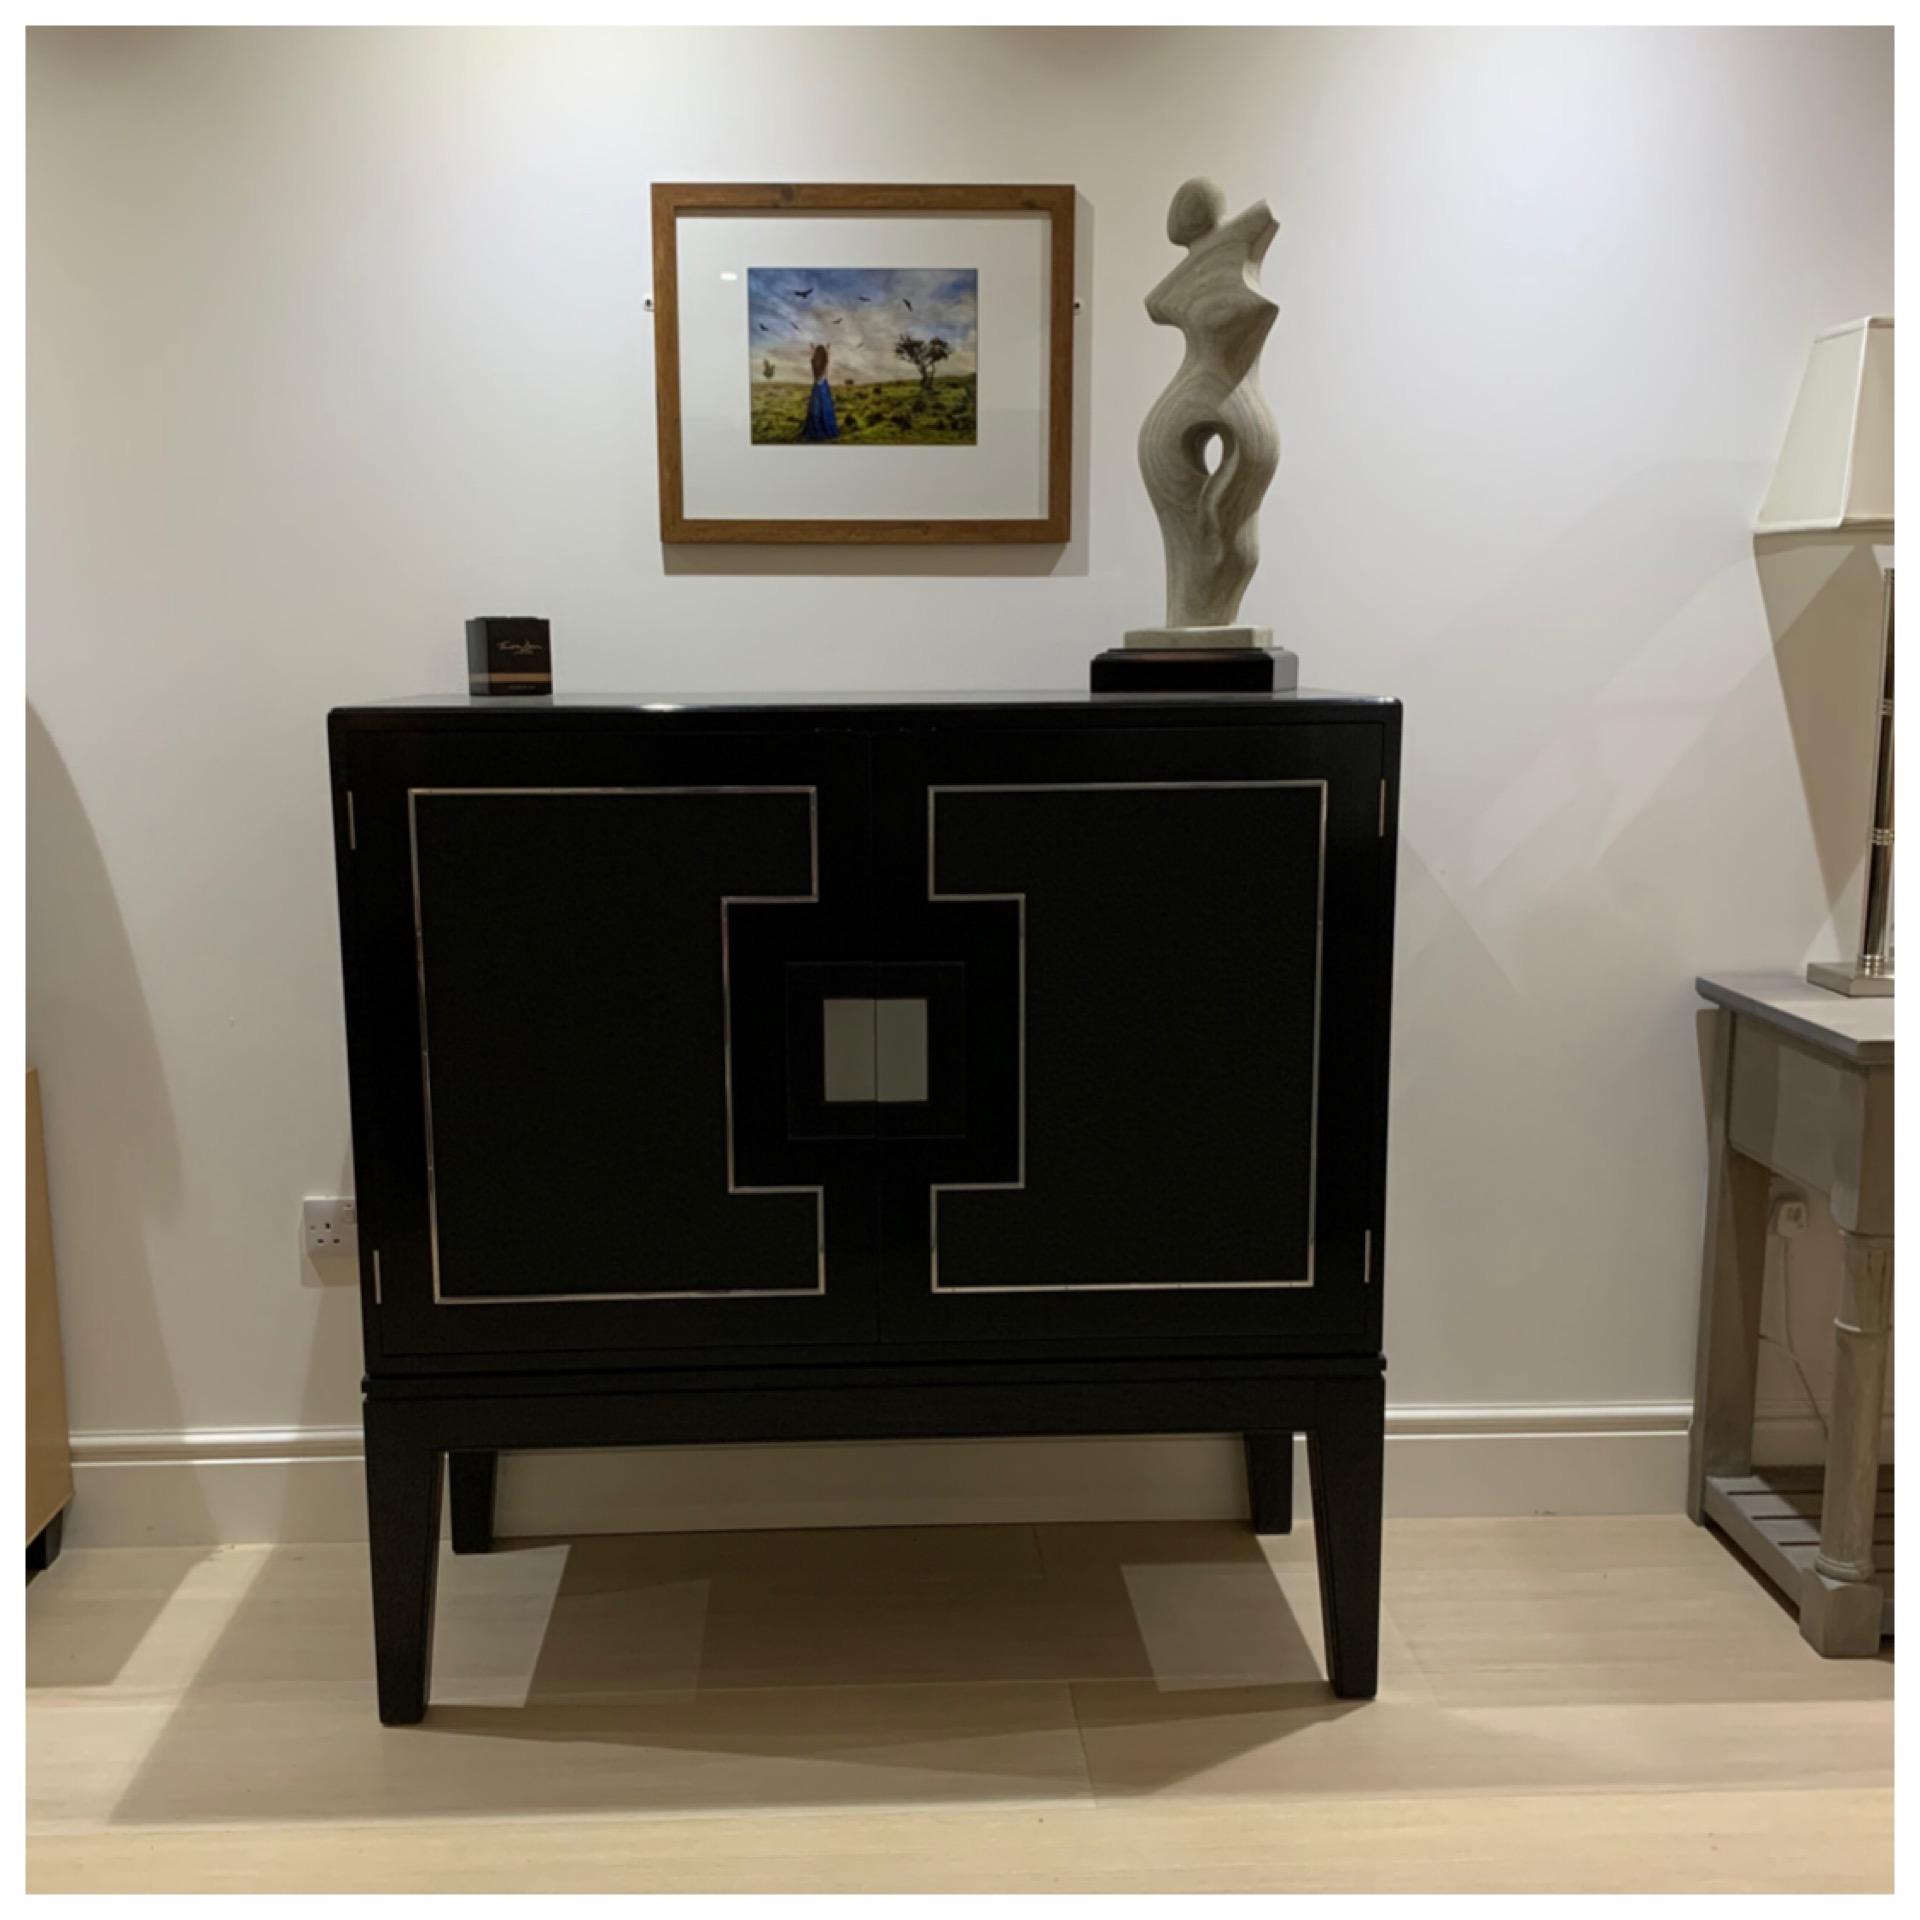 Sale Price £1,800